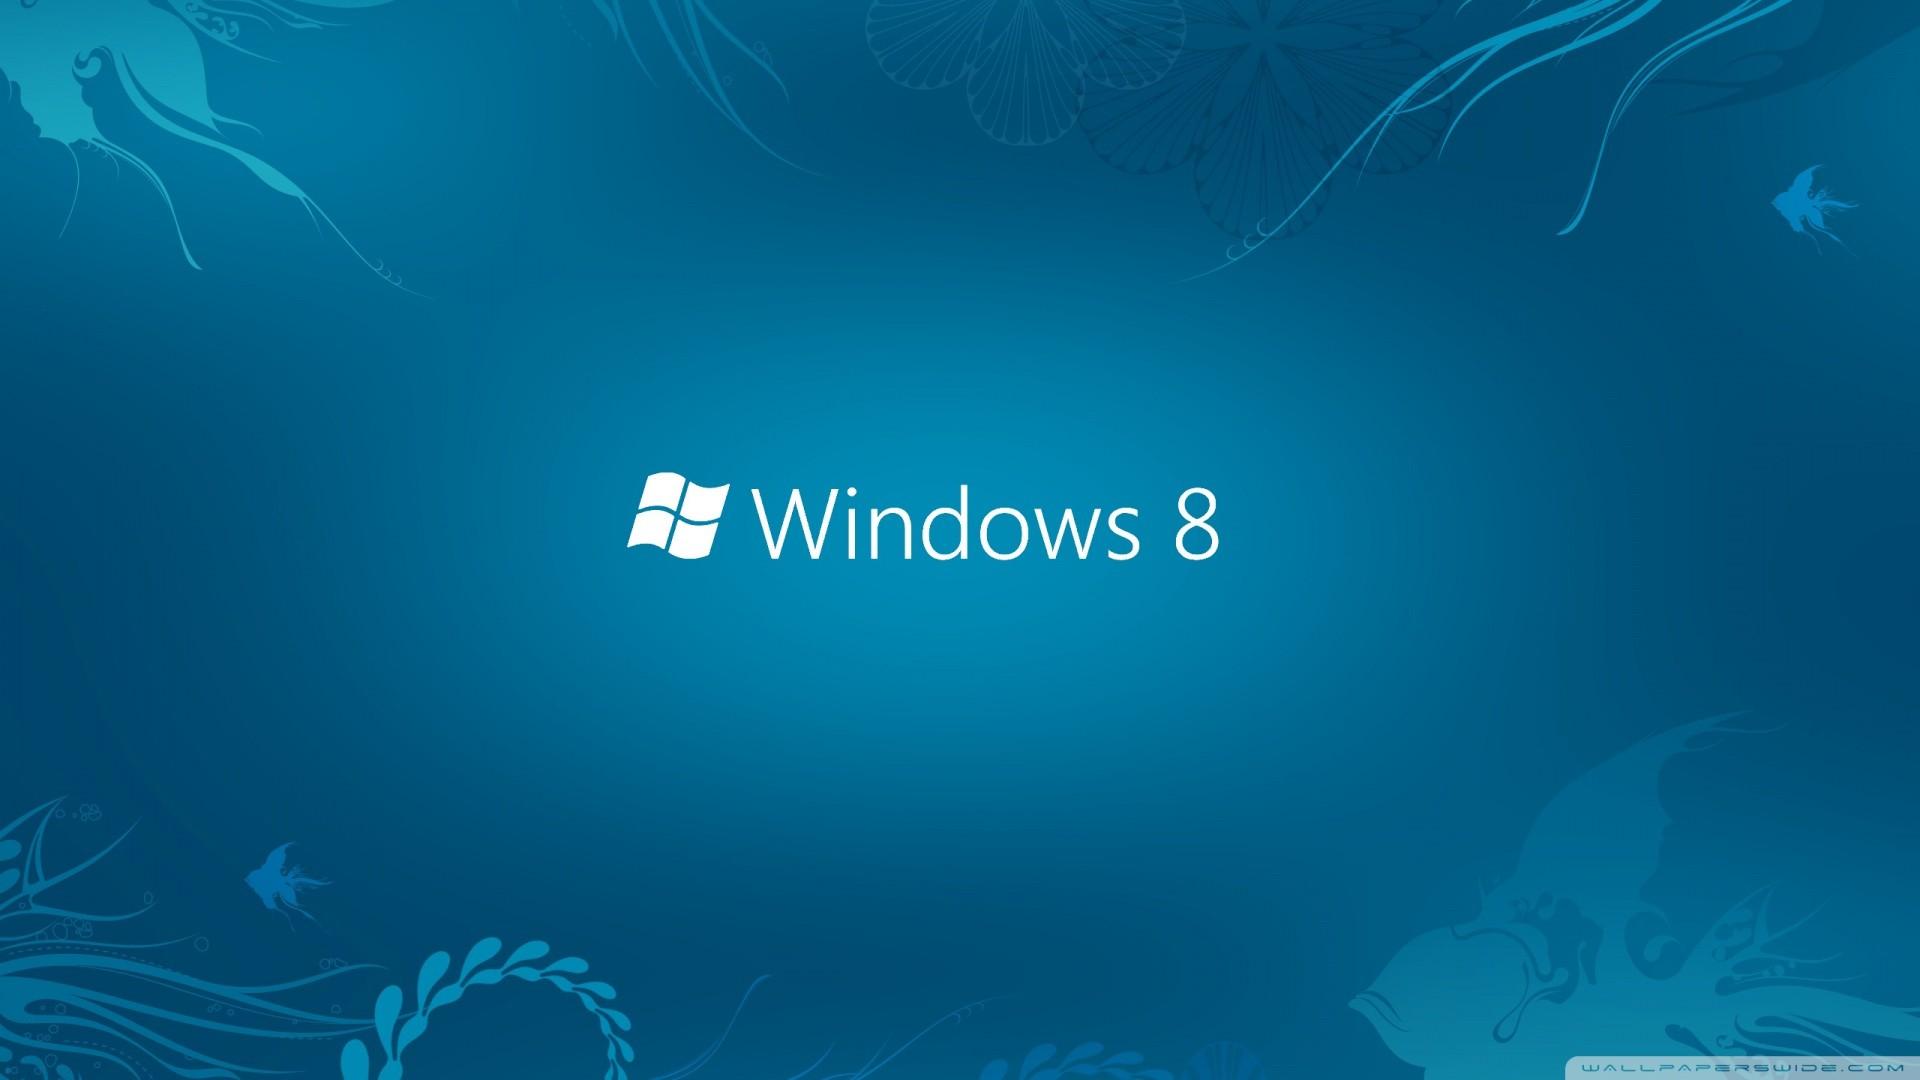 Amazing-Windows-8-Wallpaper-20.jpg